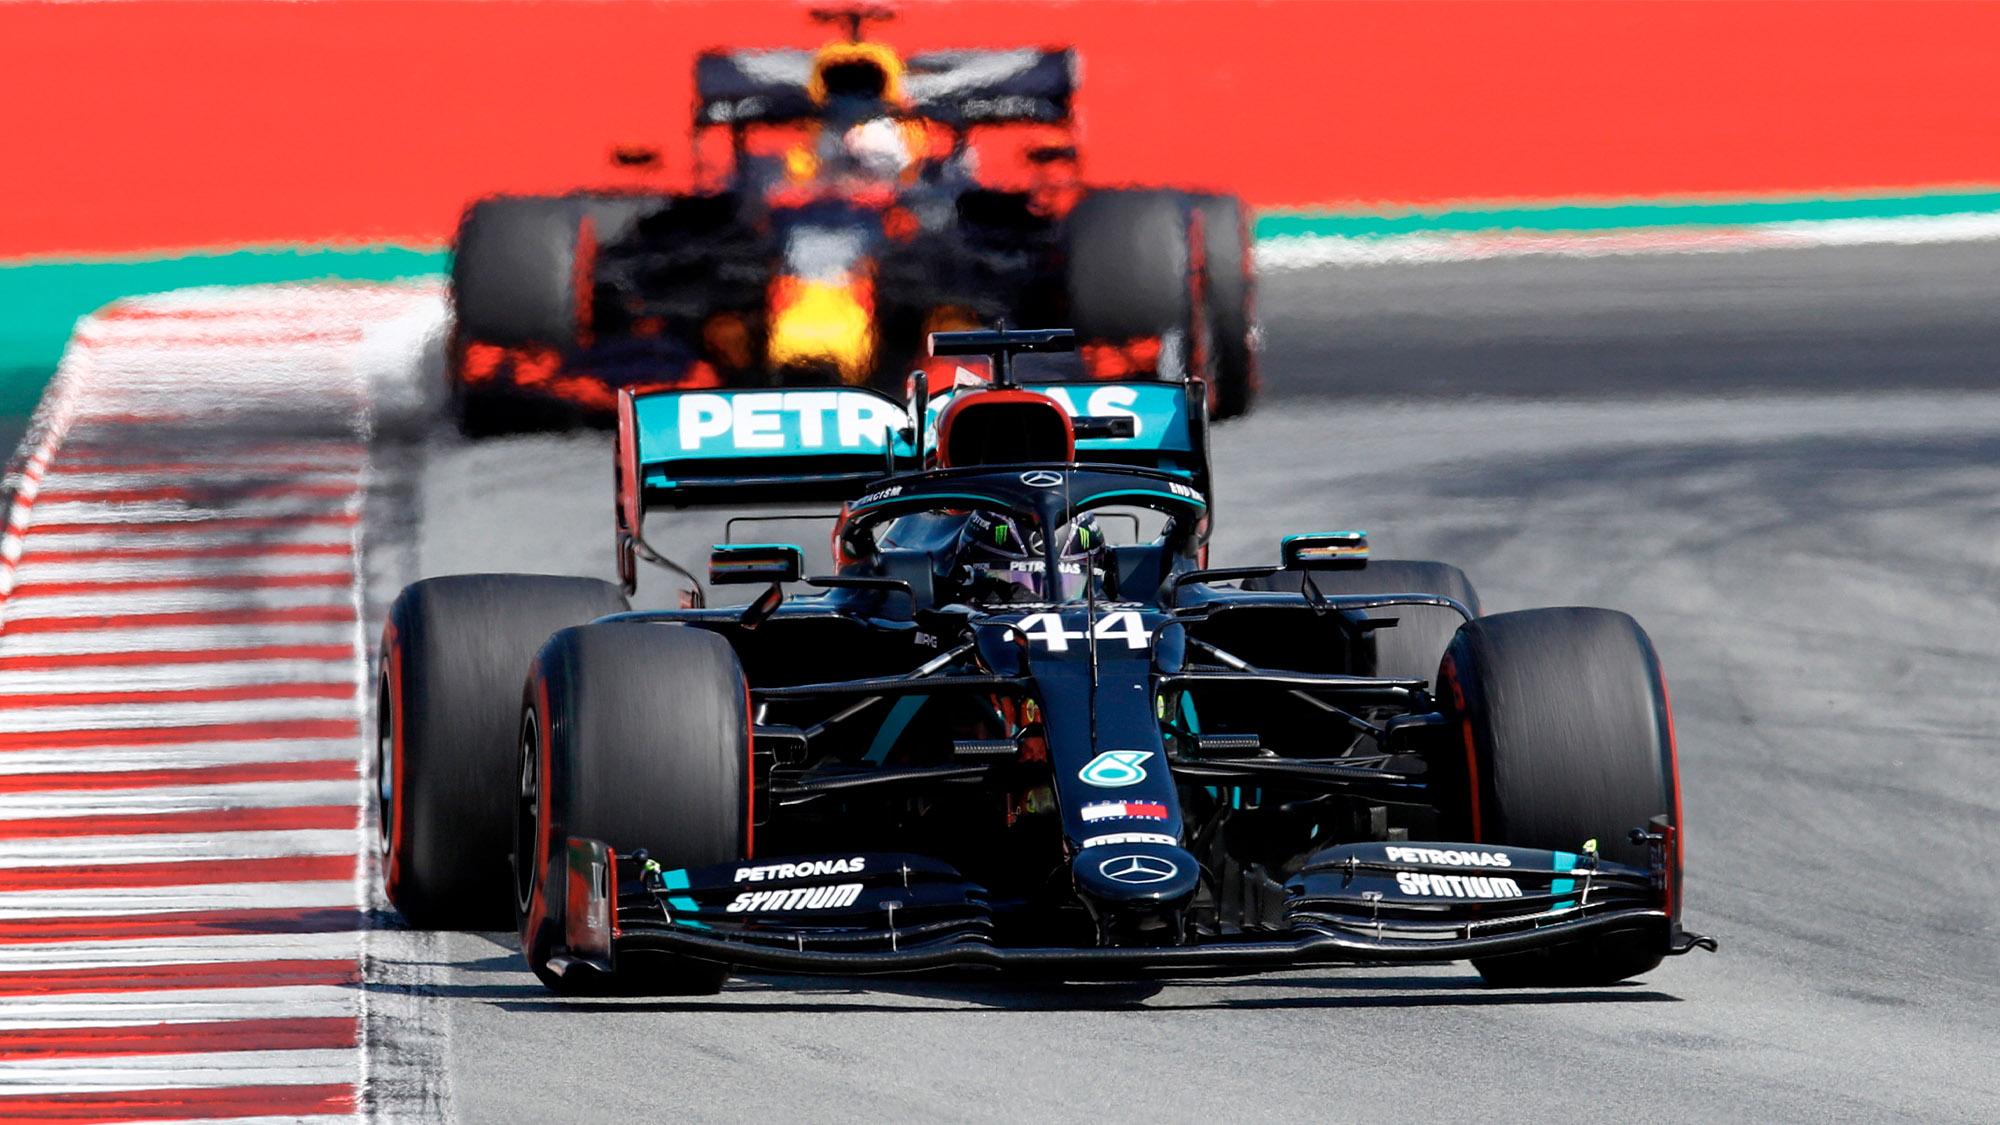 Lewis Hamilton ahead of Max Verstappen at the Circuit de Barcelona Catalunya during the 2020 F1 Spanish Grand Prix